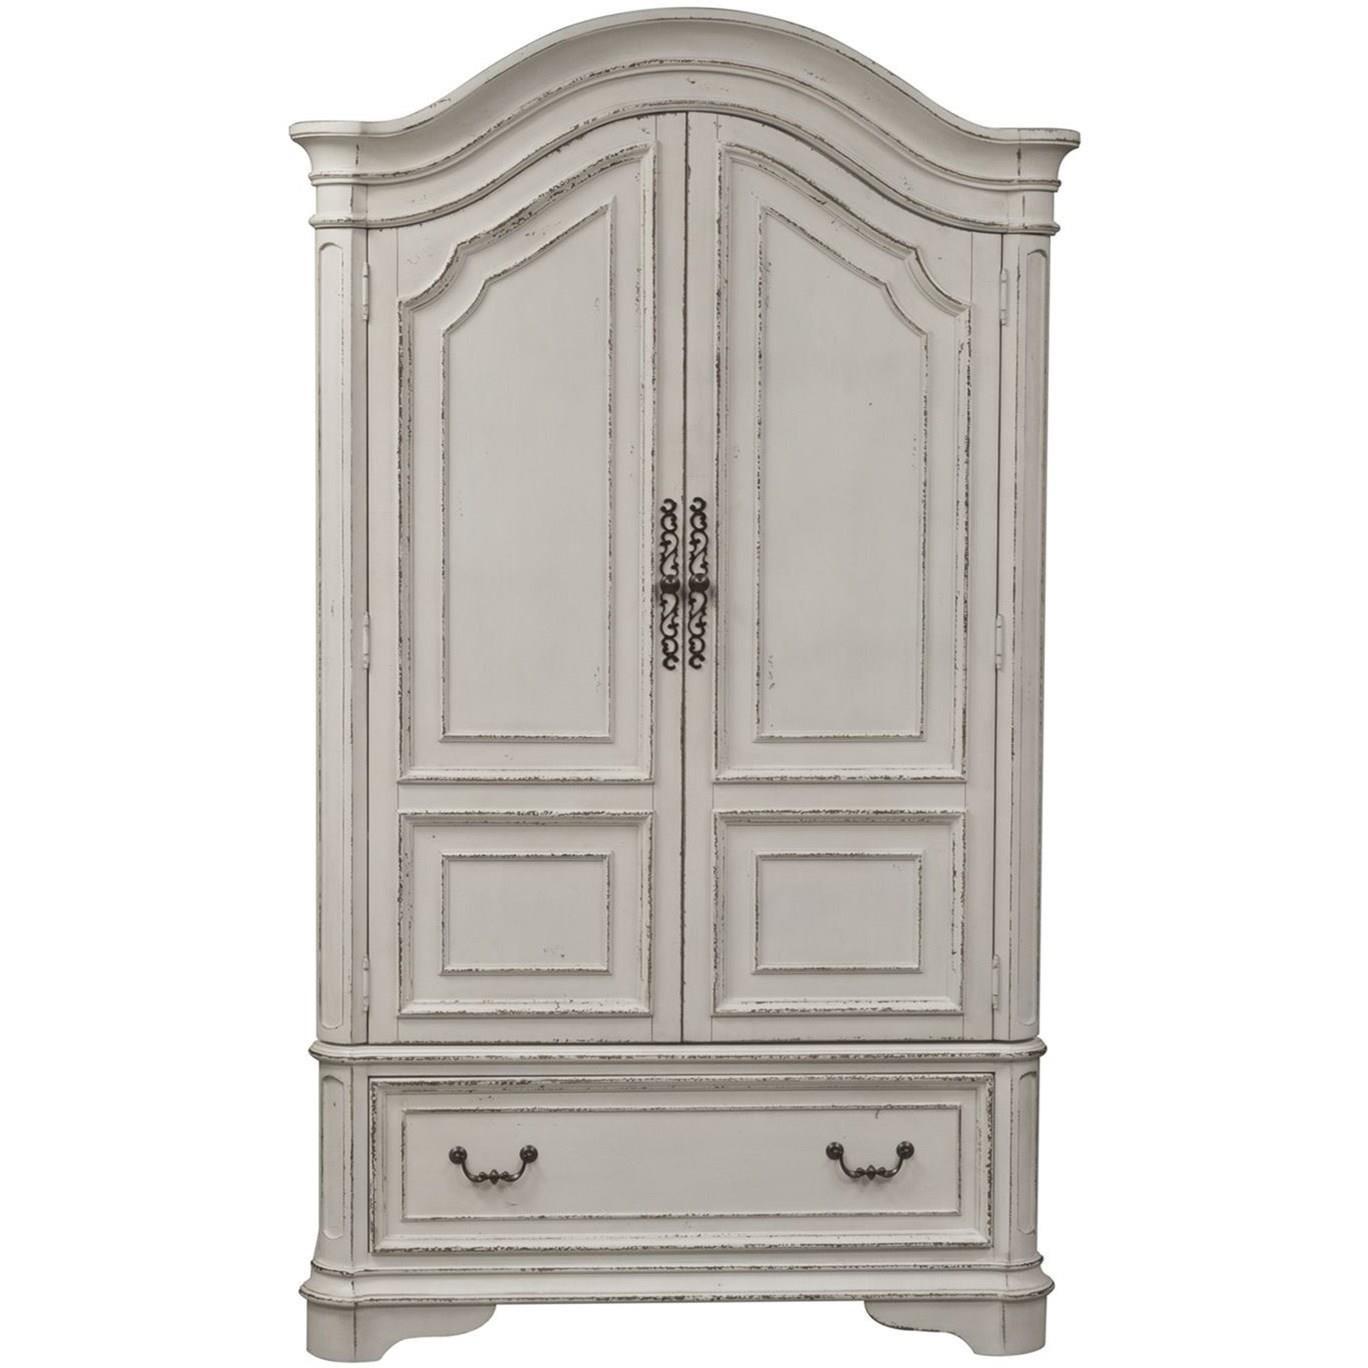 Magnolia Manor Armoire by Sarah Randolph Designs at Virginia Furniture Market